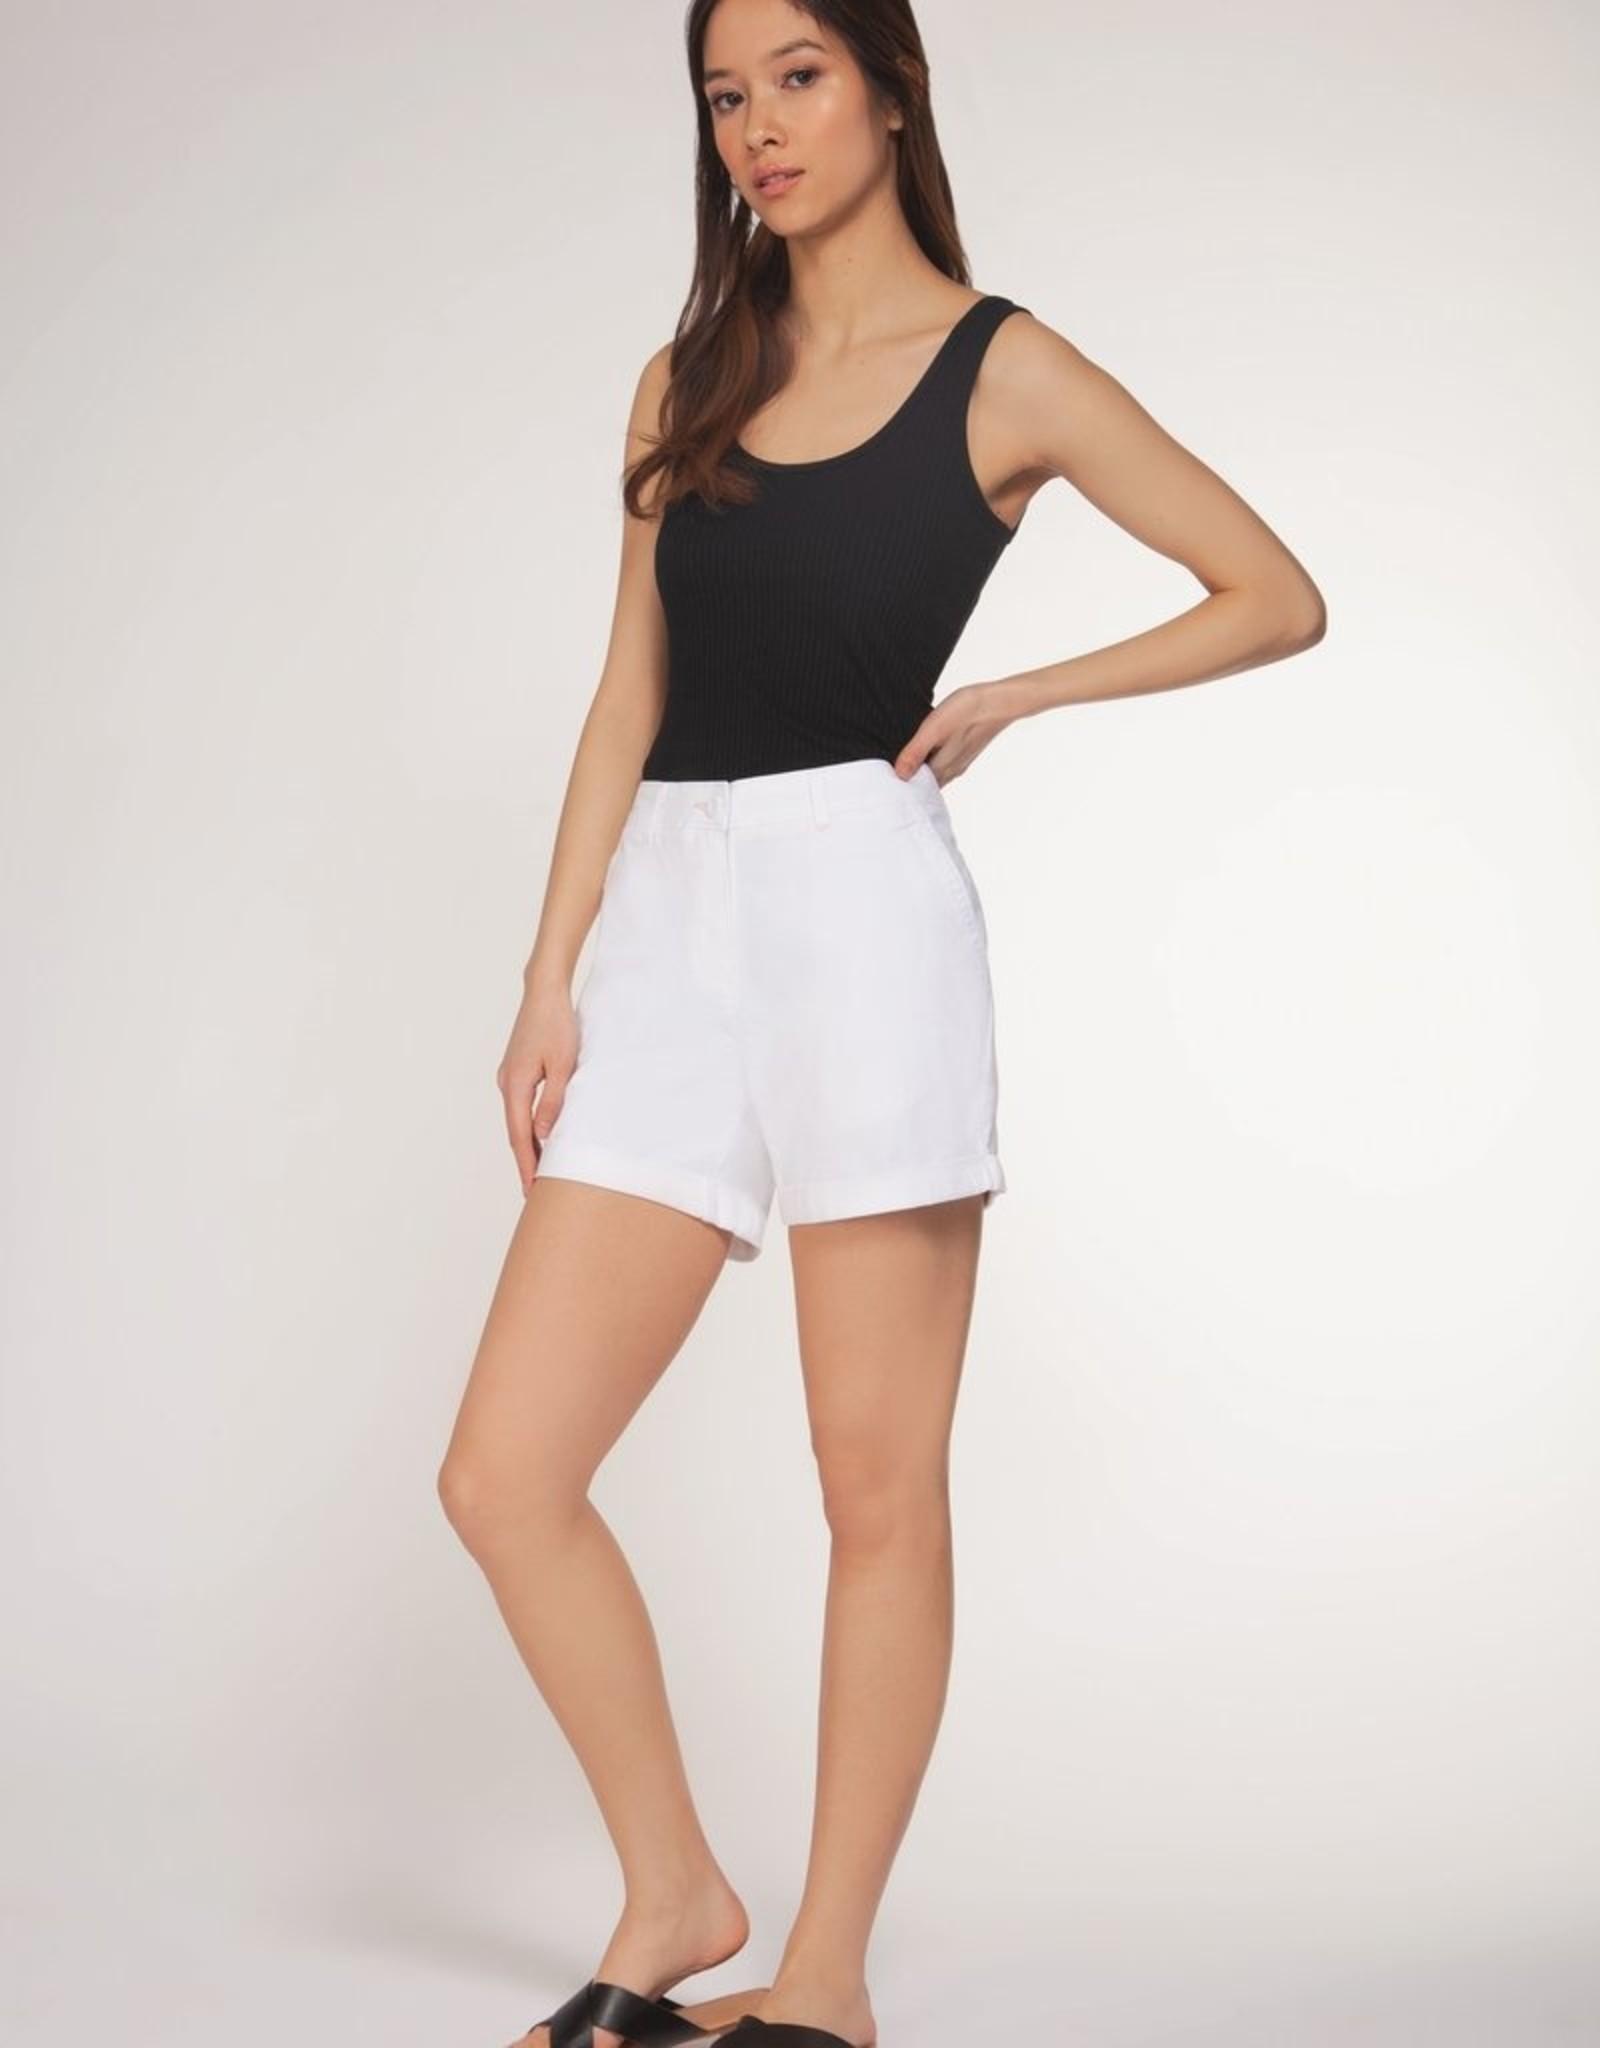 Dex Bros Clothing Co Ltd. ribbed bodysuit, black